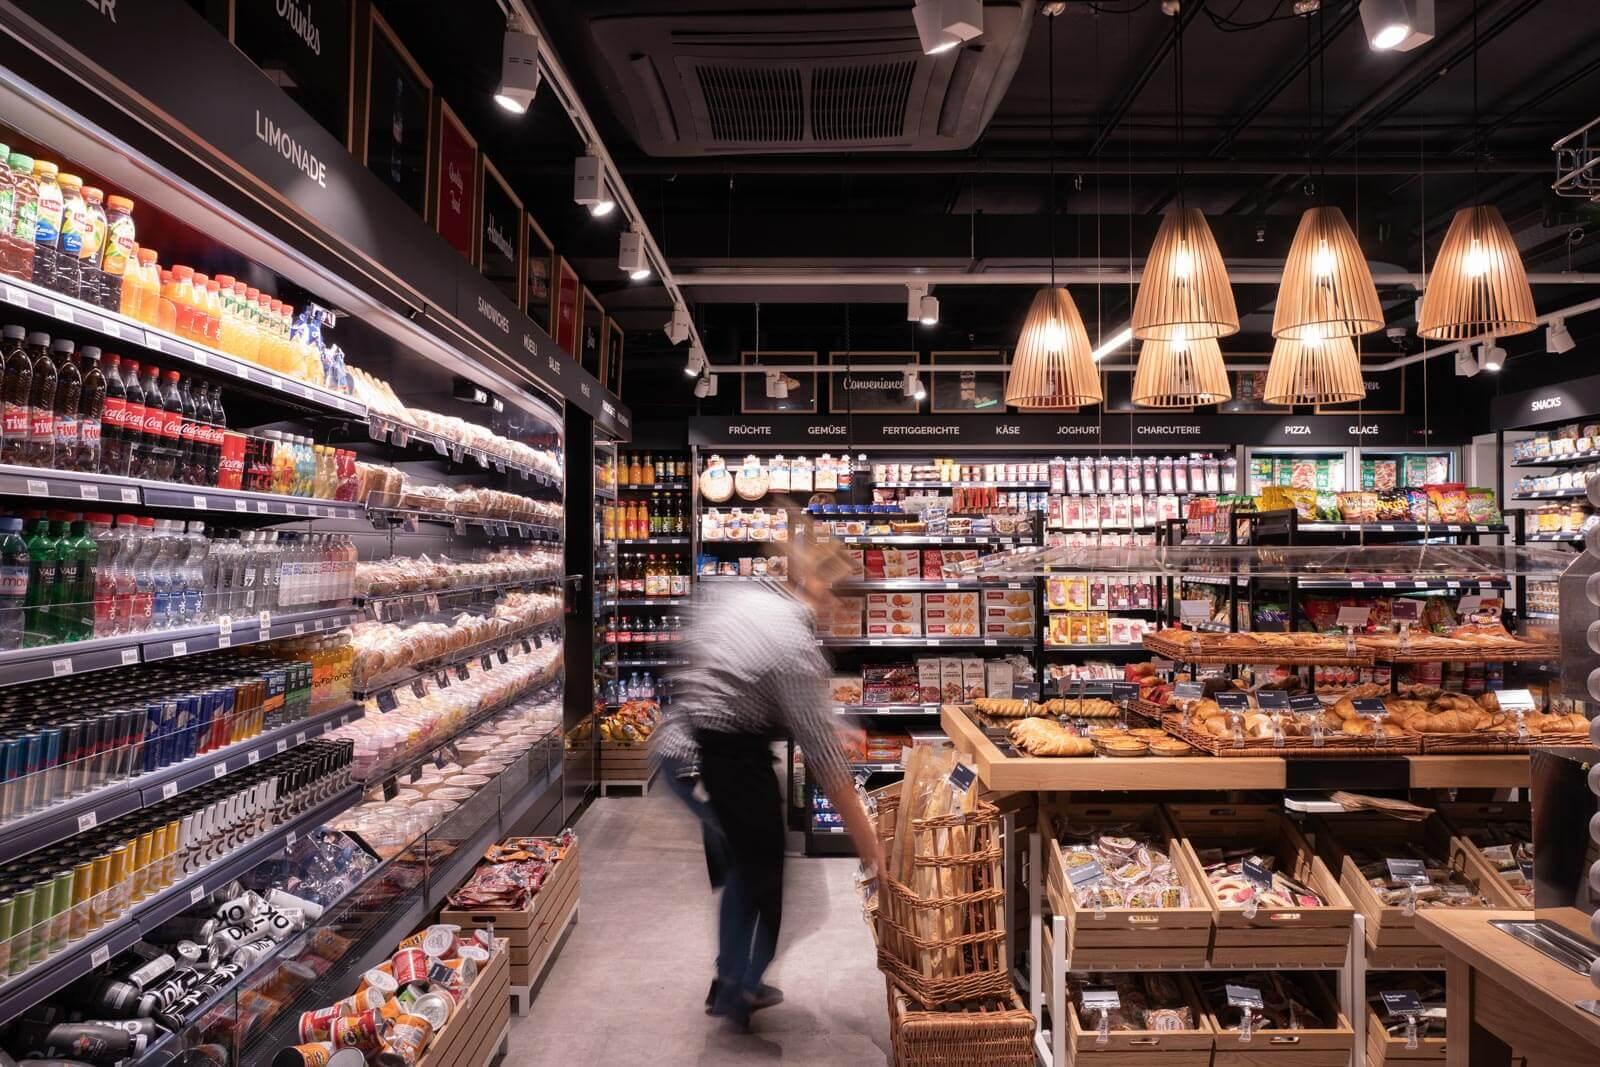 avec, Zürich Oerlikon, Convenience, Food